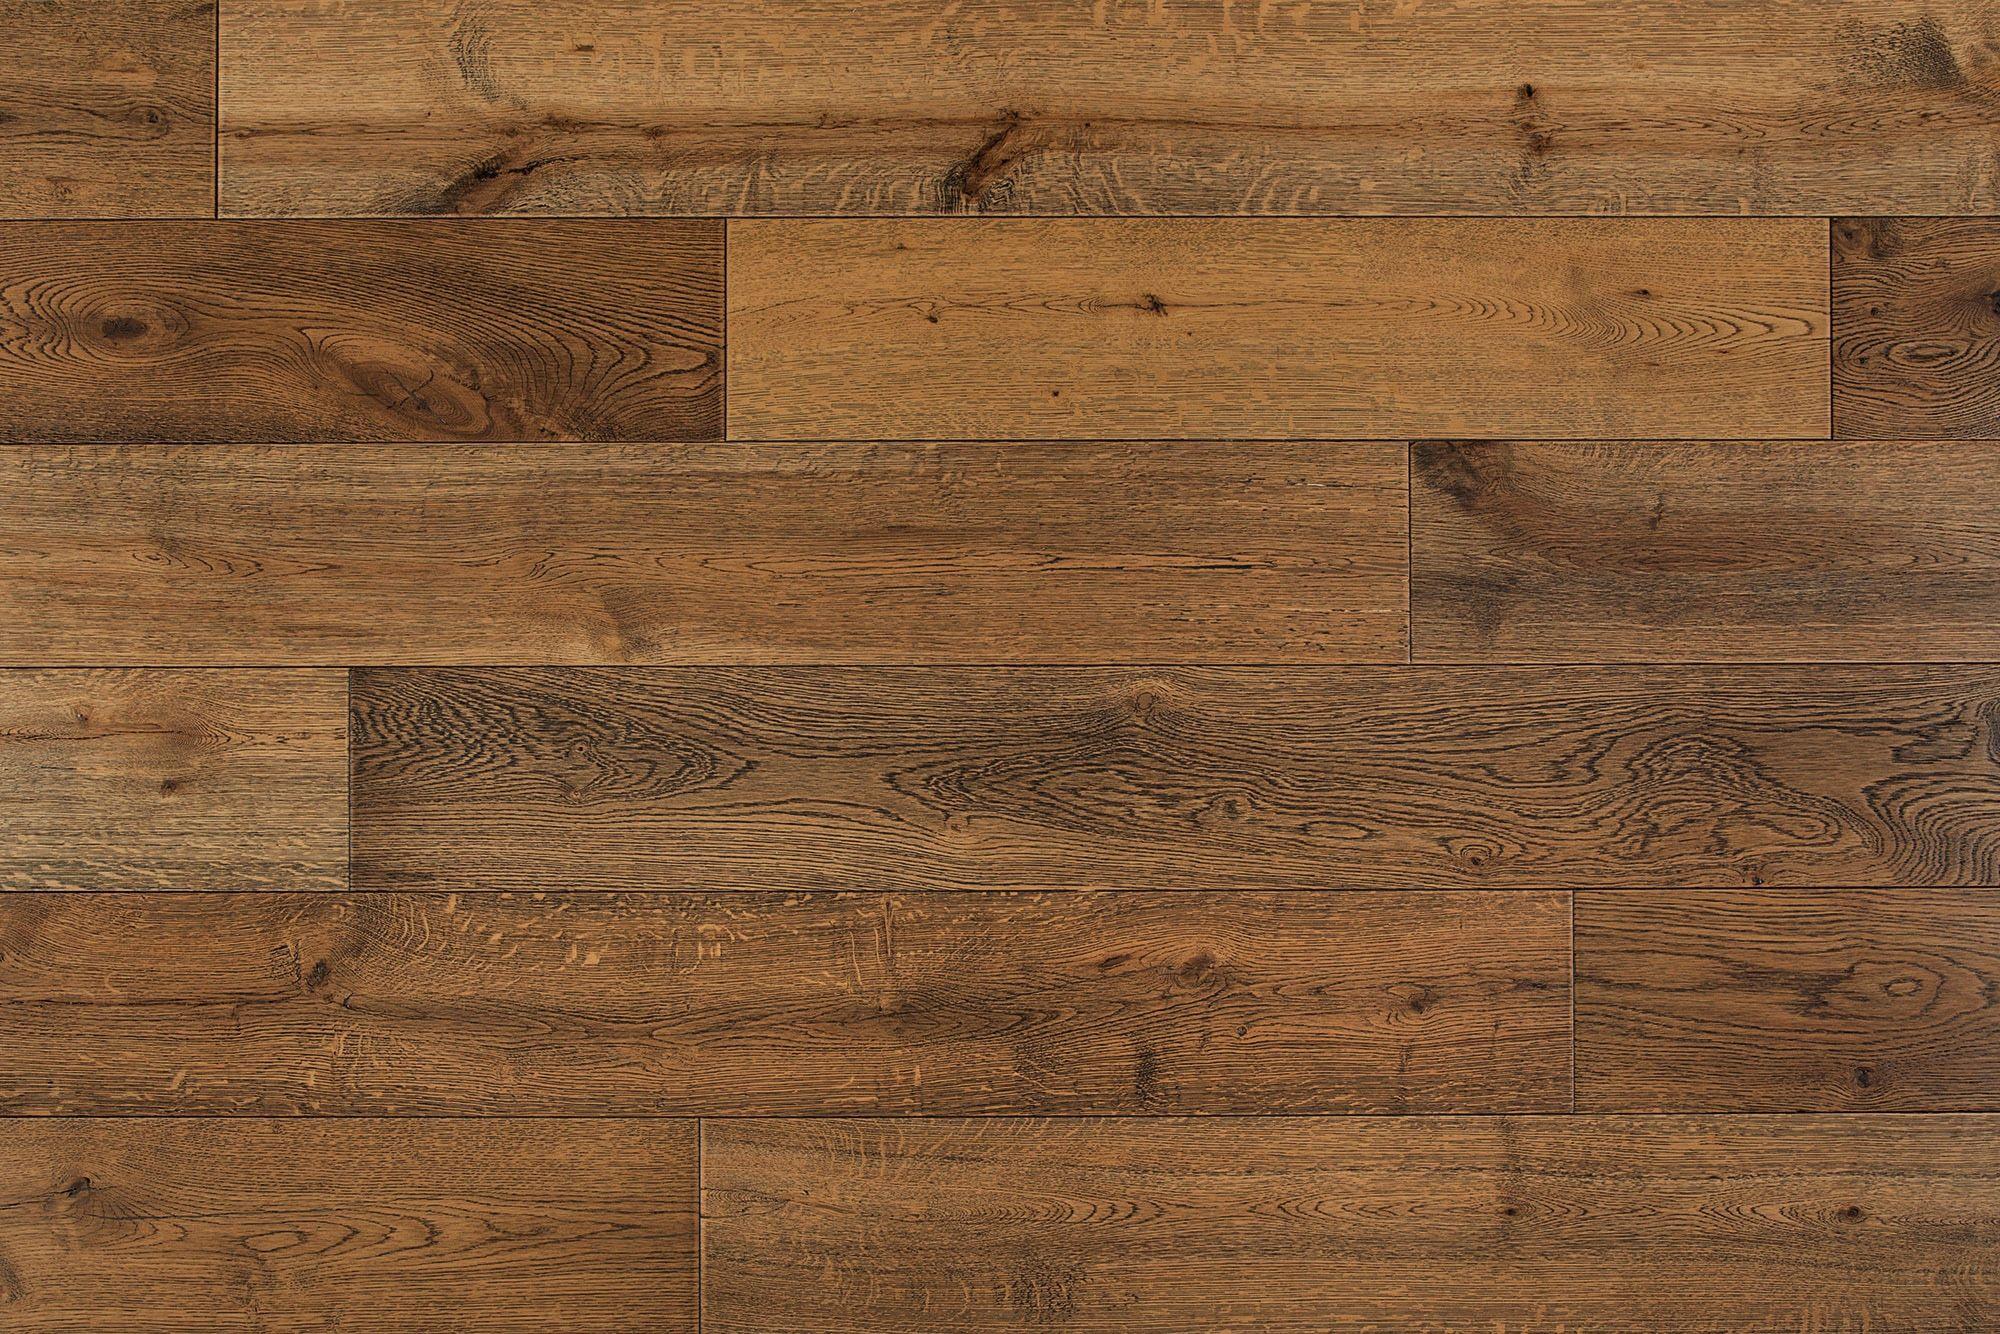 Builddirect Vanier Engineered Hardwood Longhorn Collection Engineered Hardwood Hardwood Builddirect